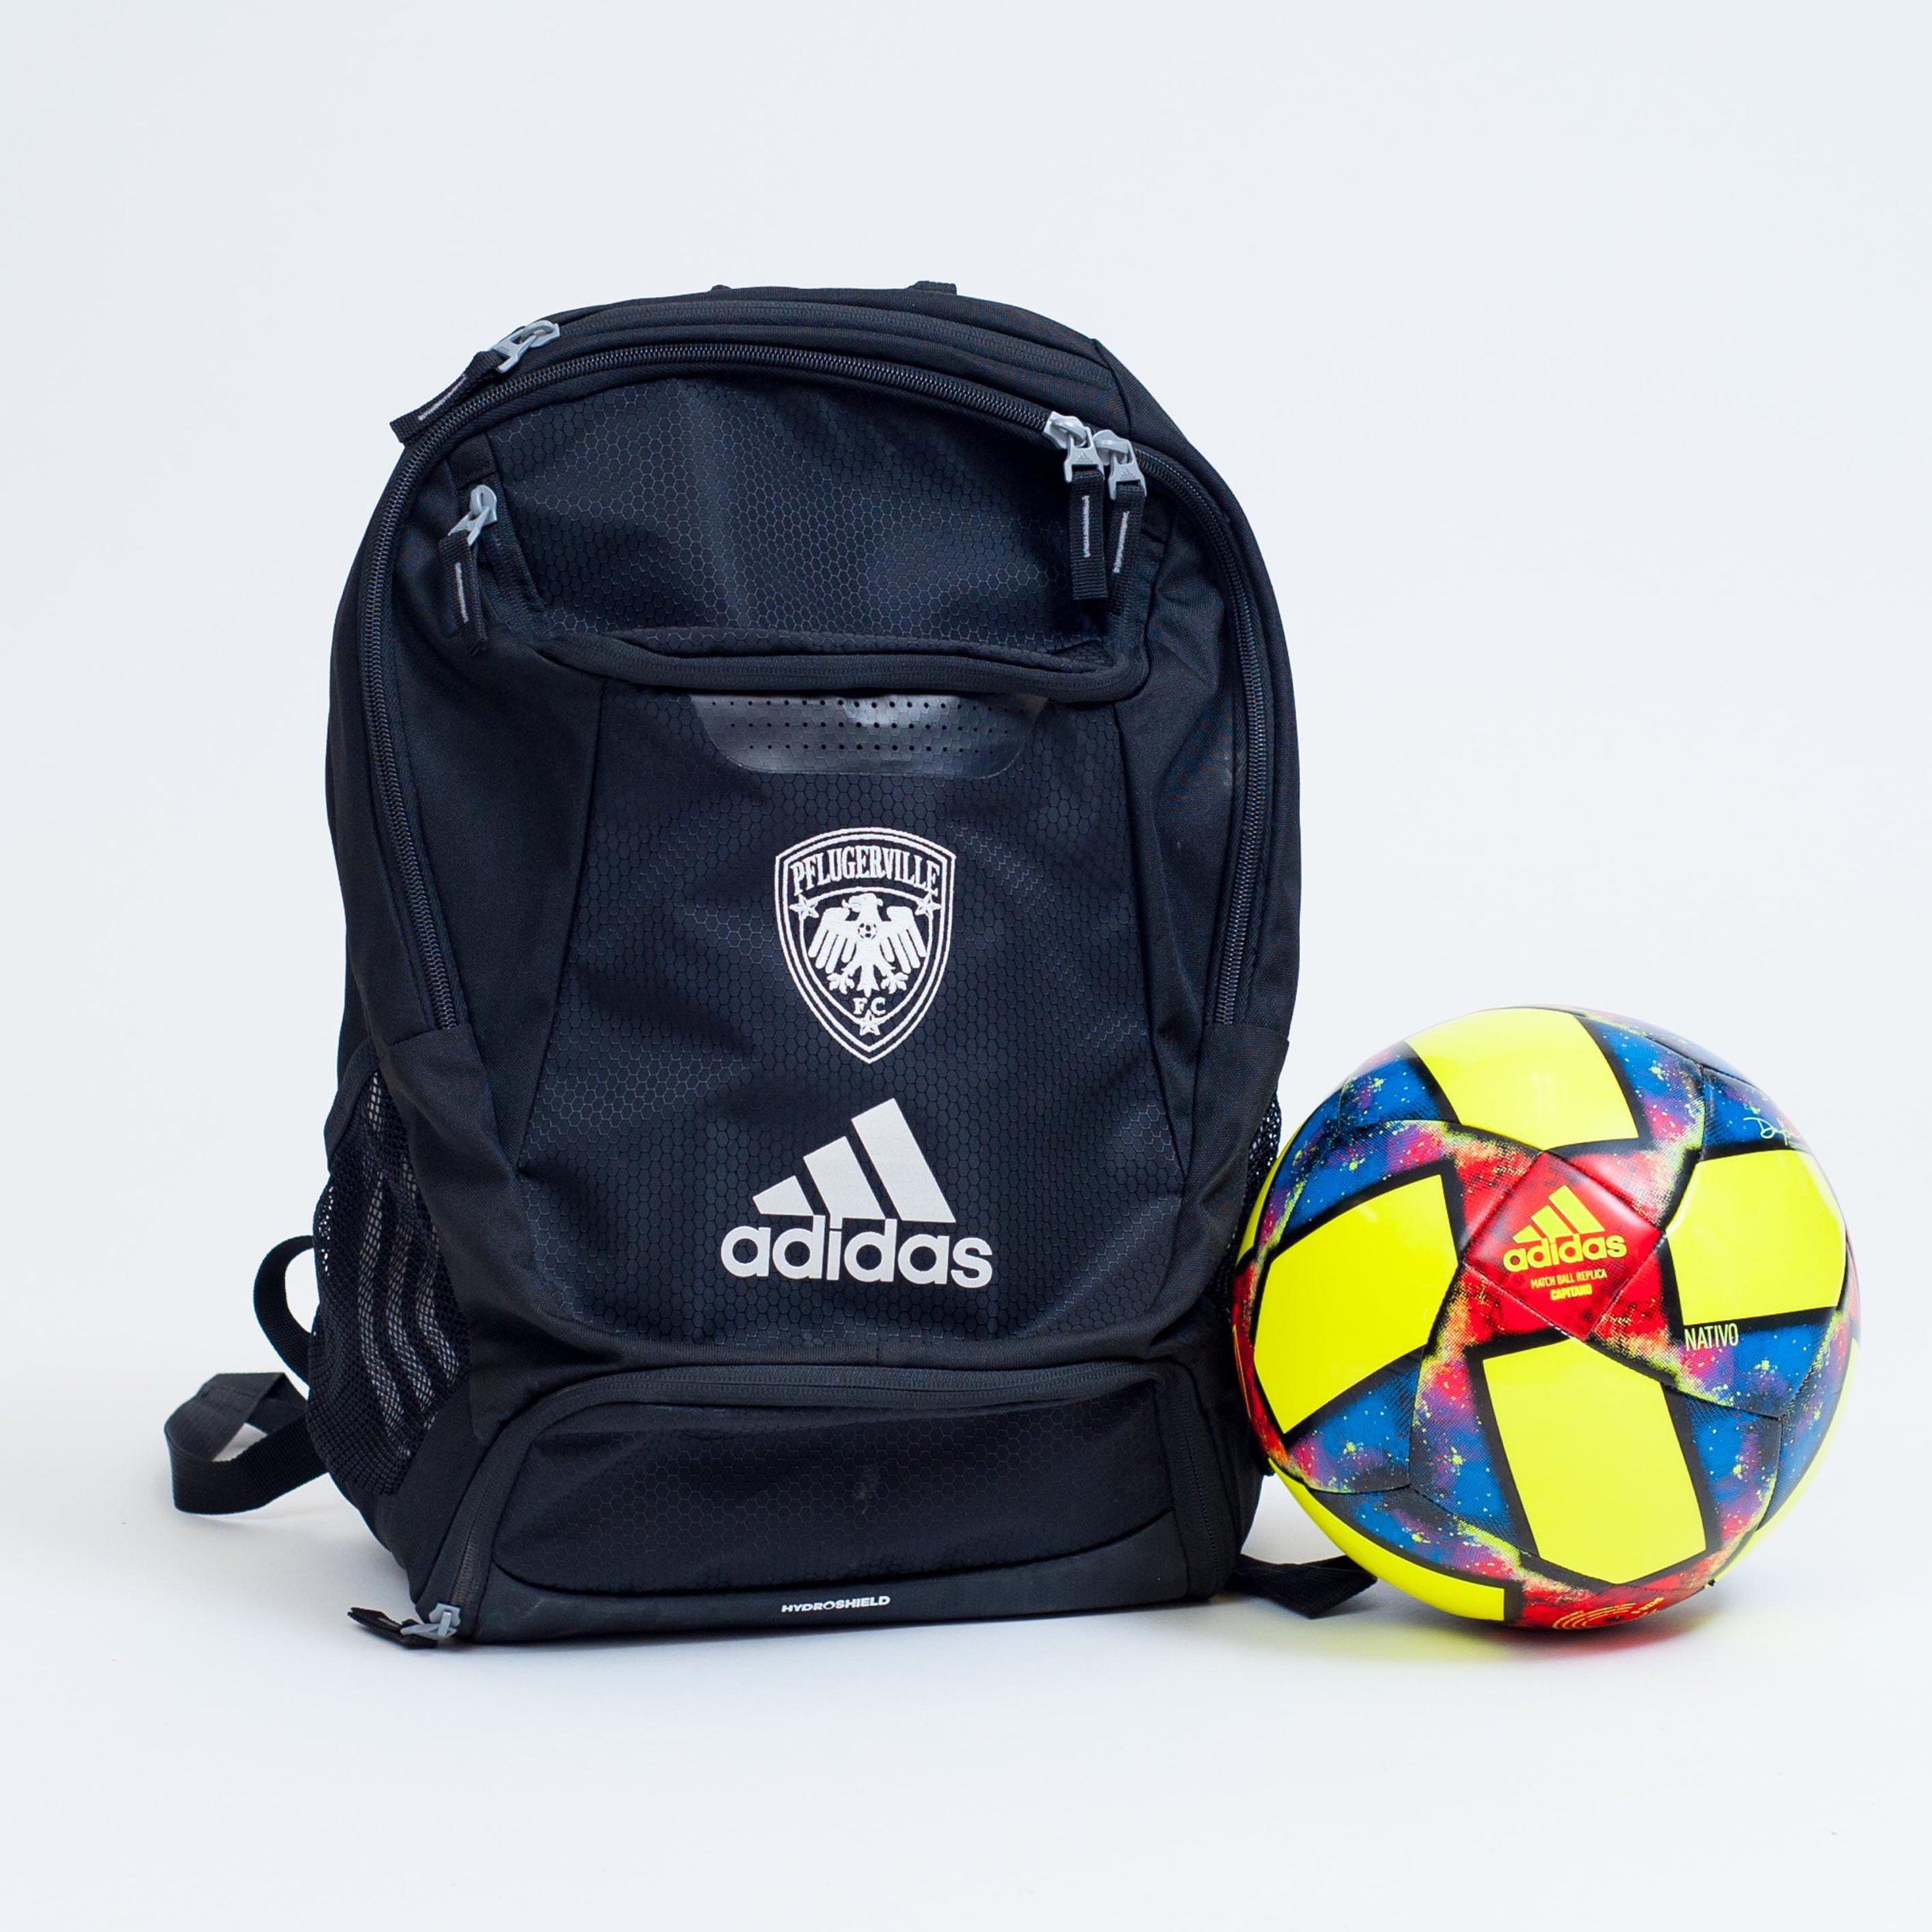 Pflugerville FC Select: Gear bag.  Optional